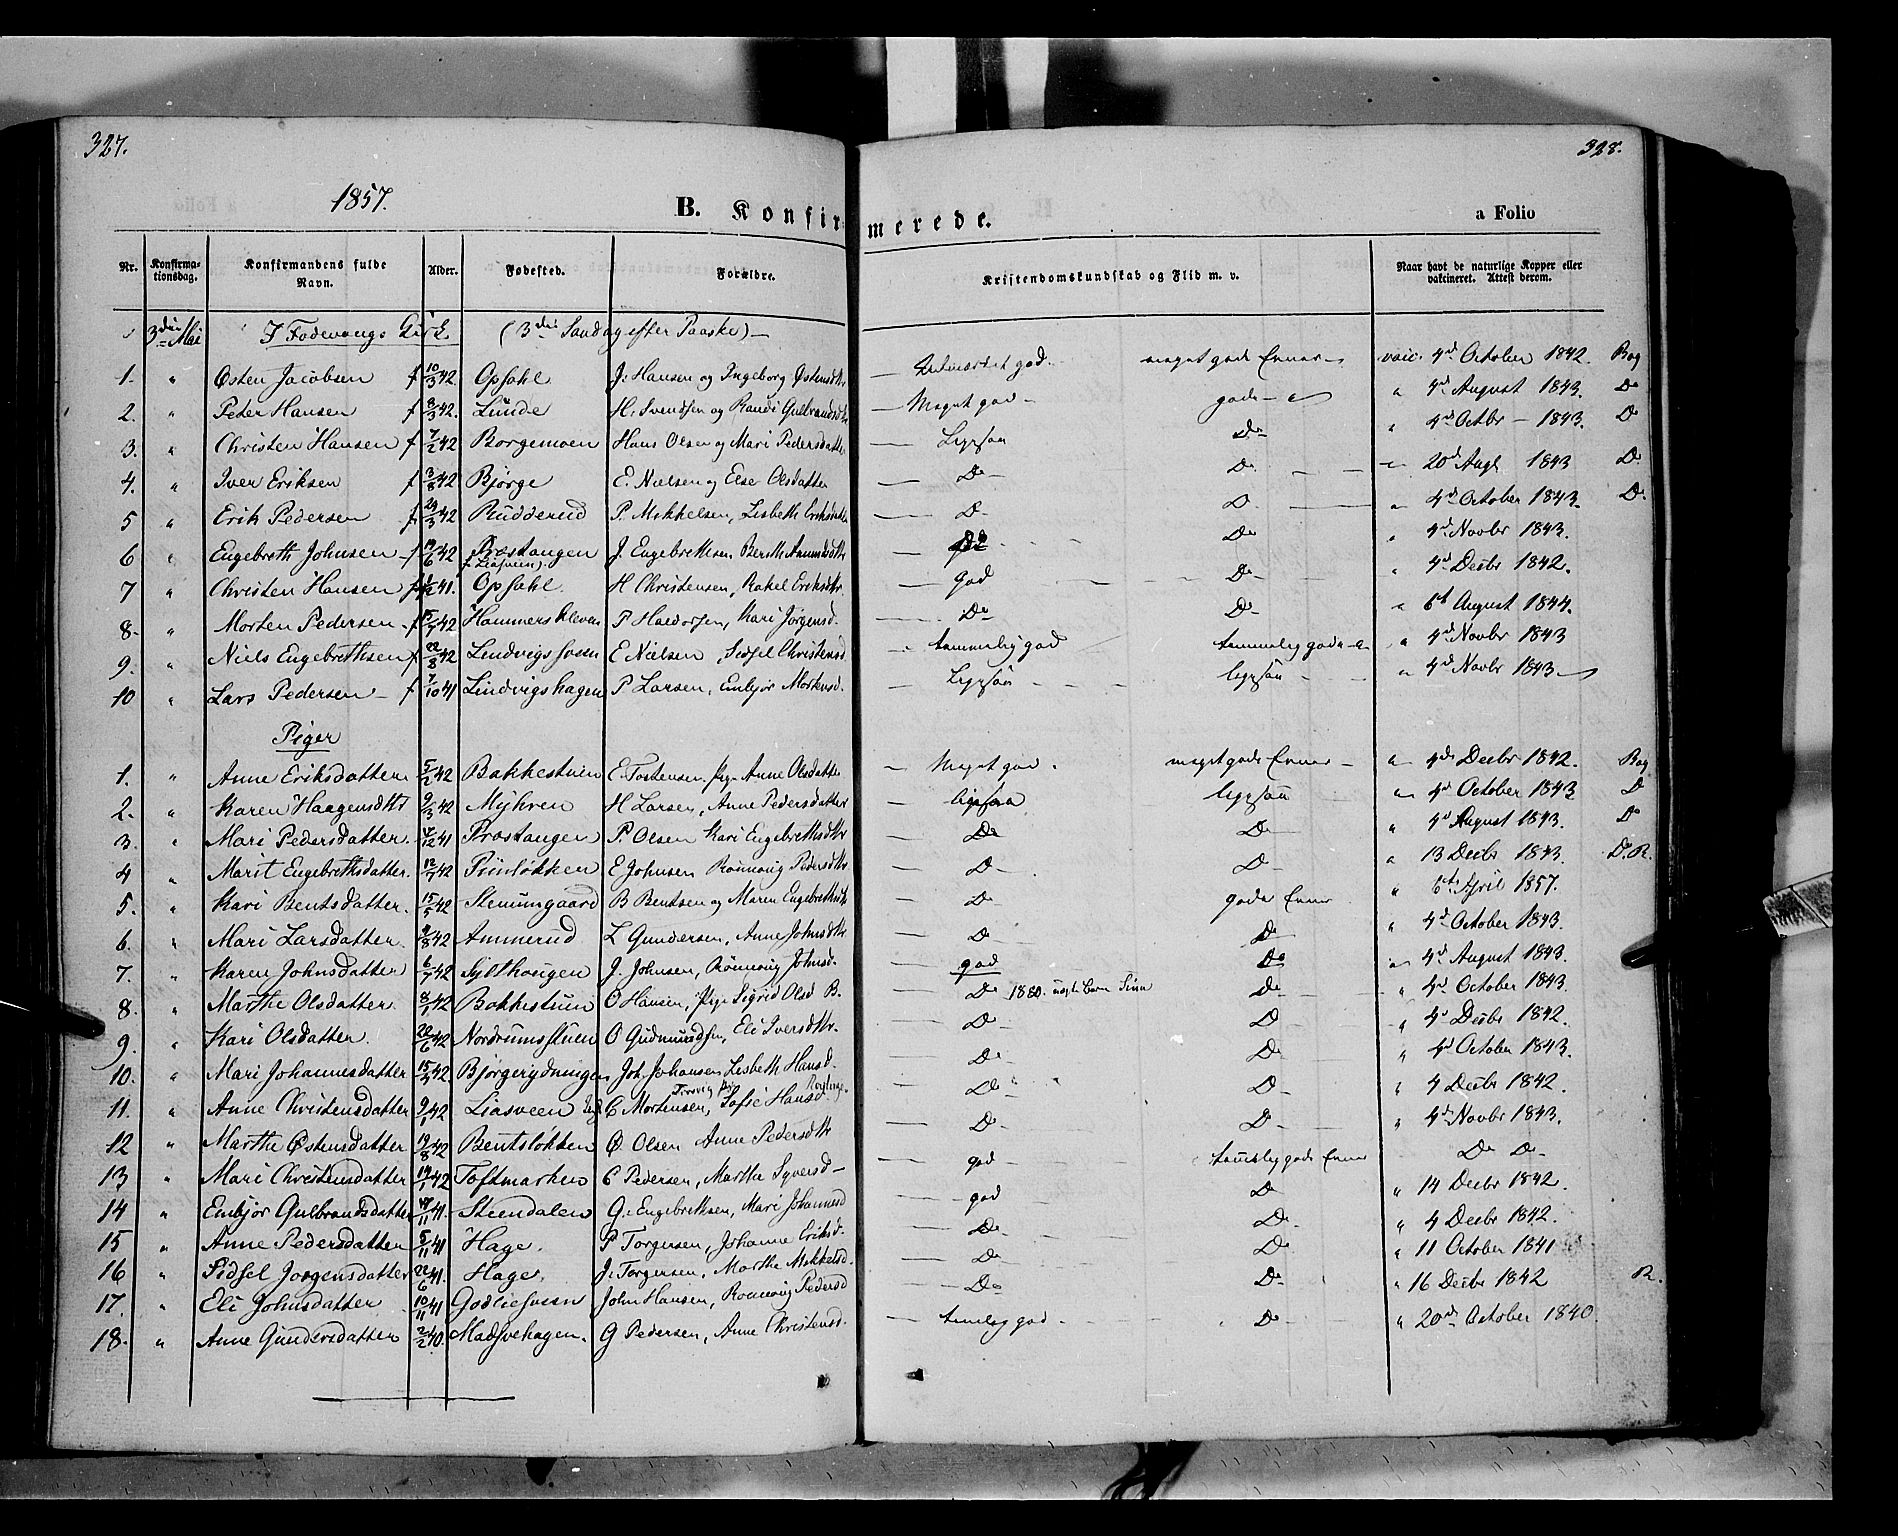 SAH, Ringebu prestekontor, Ministerialbok nr. 6, 1848-1859, s. 327-328